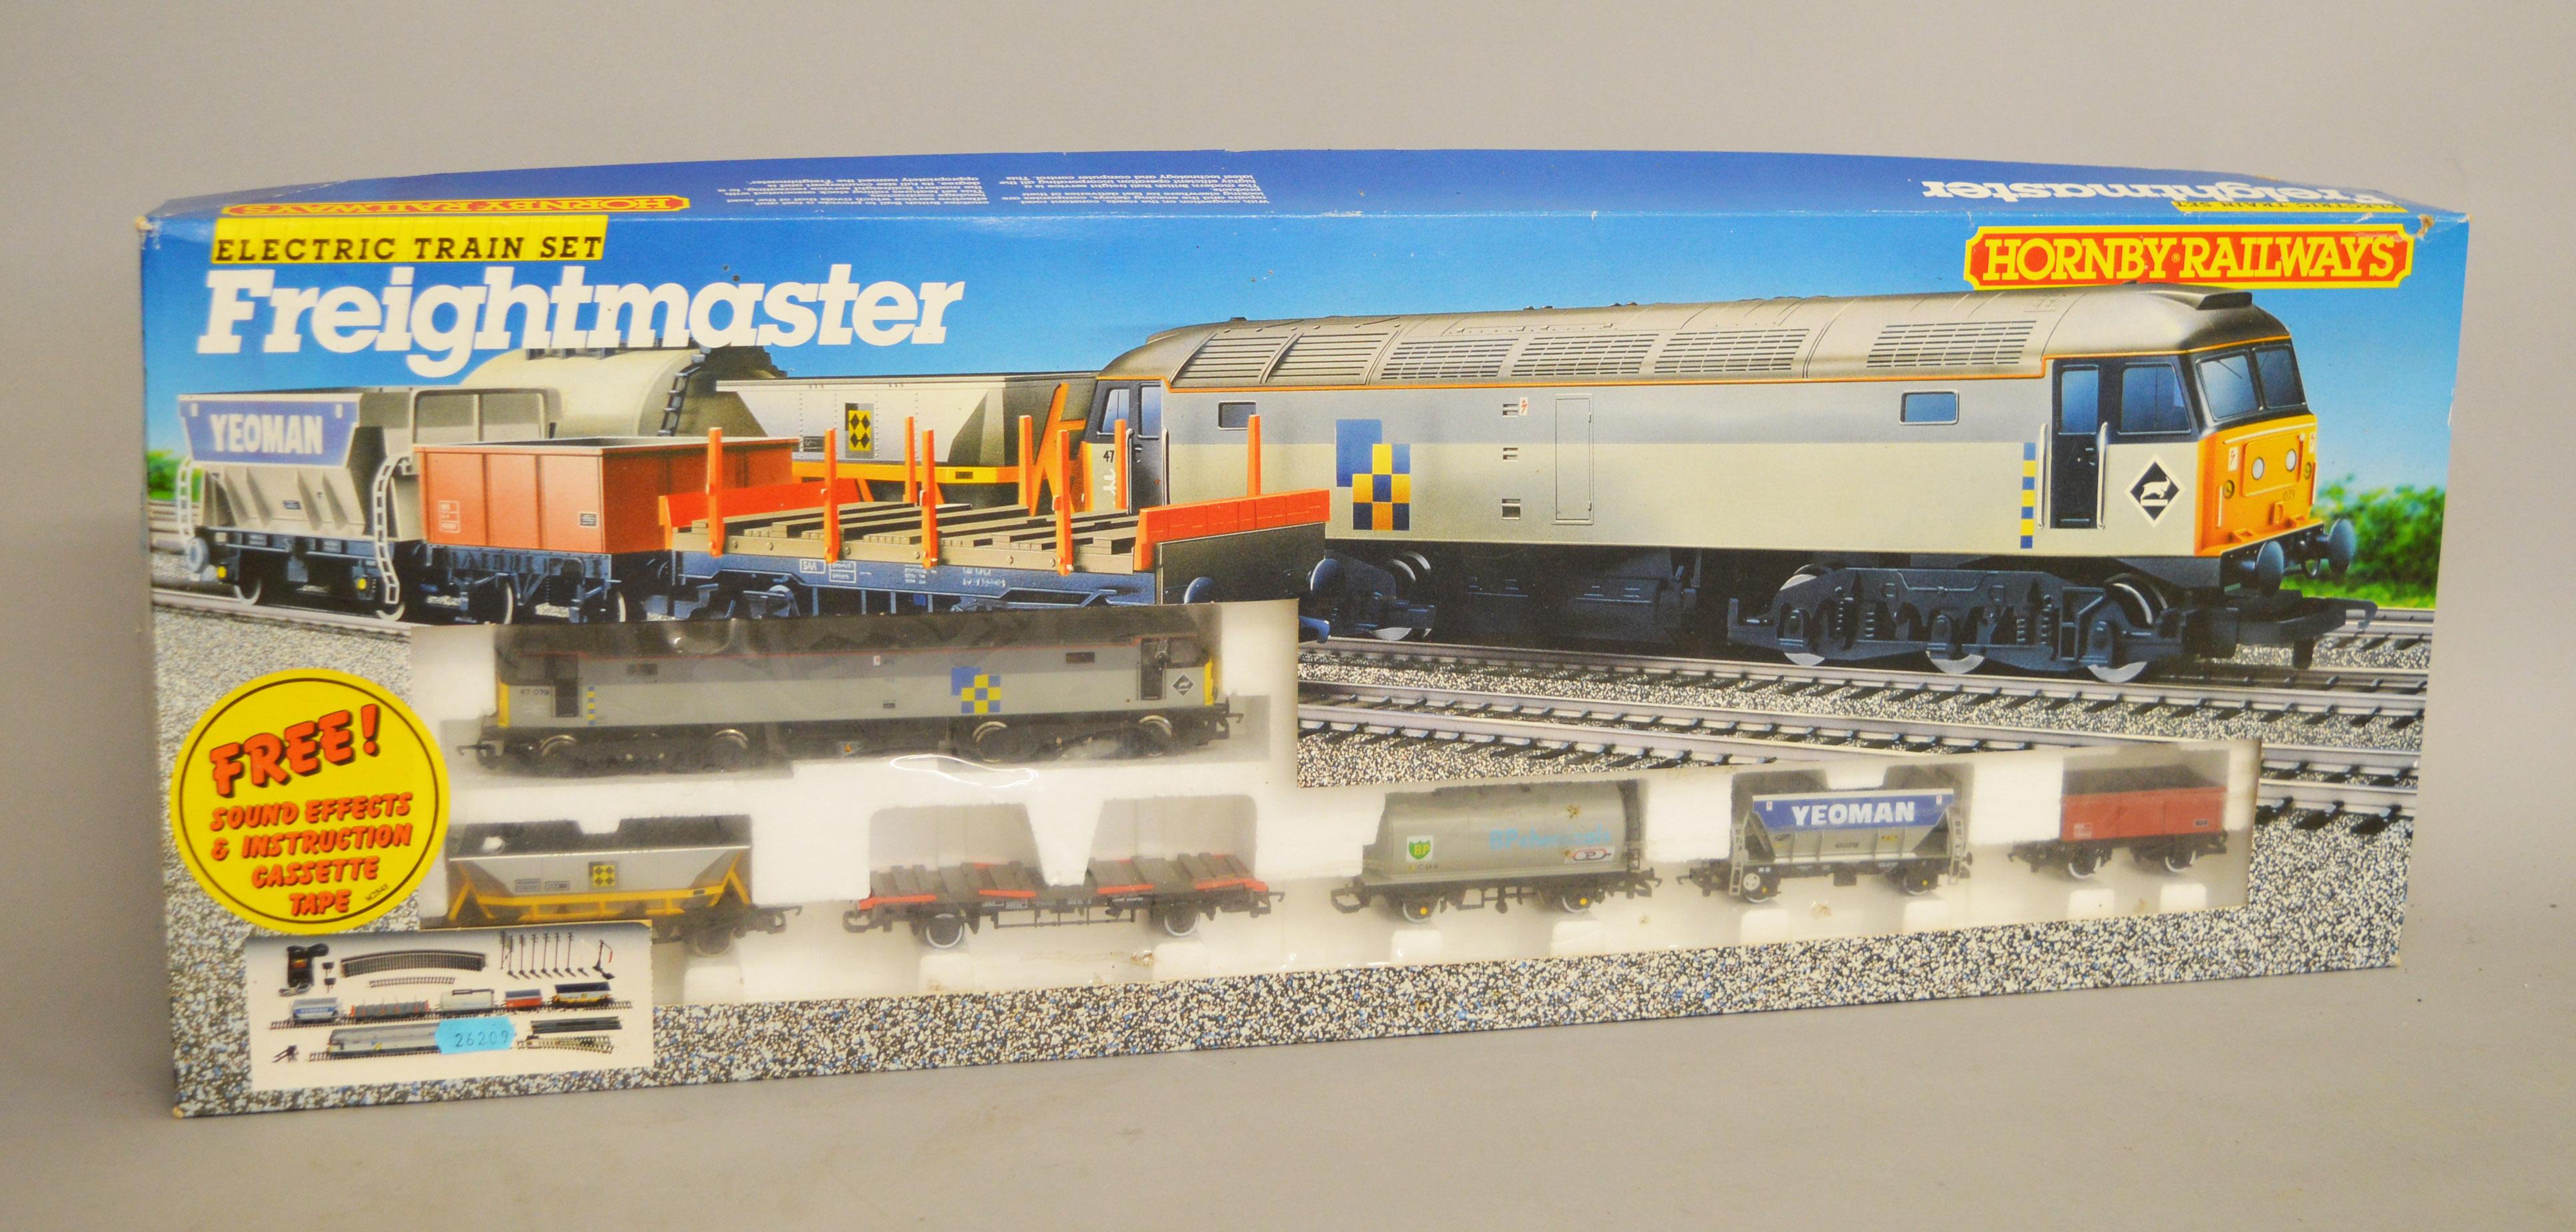 Lot 31 - OO gauge. Hornby R697 Freightmaster train set, comprising: Class 47 diesel locomotive; five wagons.